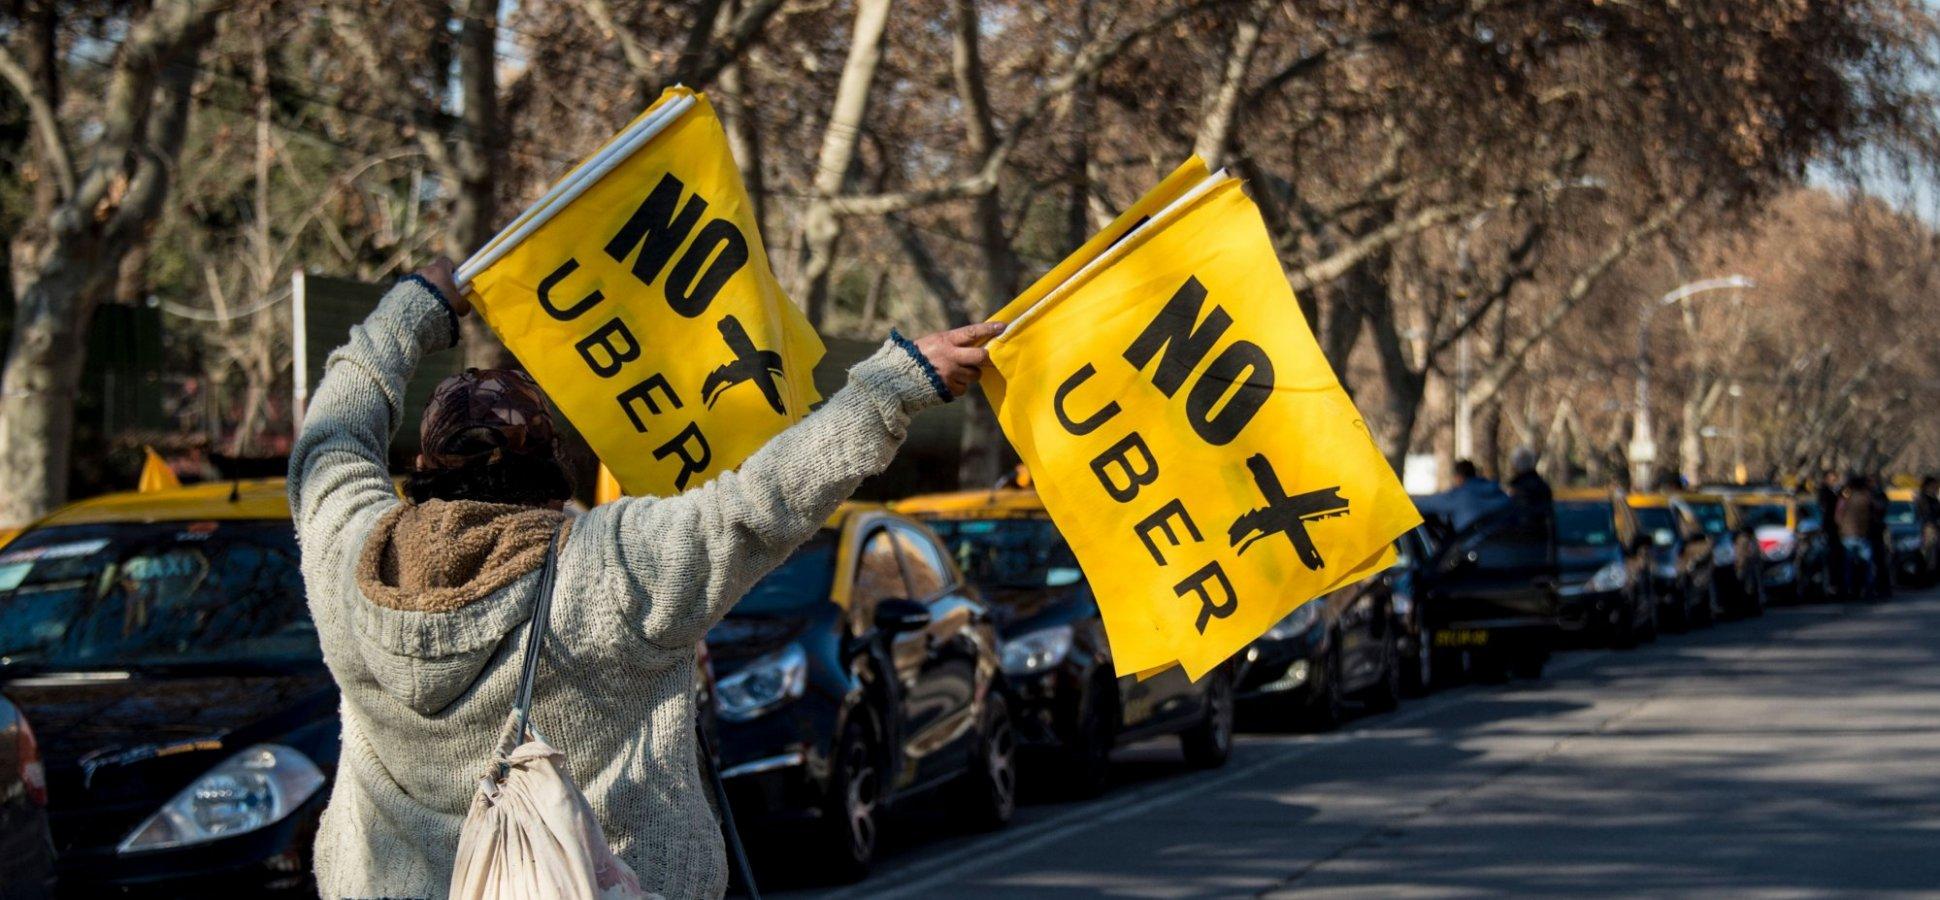 California Passes Legislation that May Kill the Gig Economy